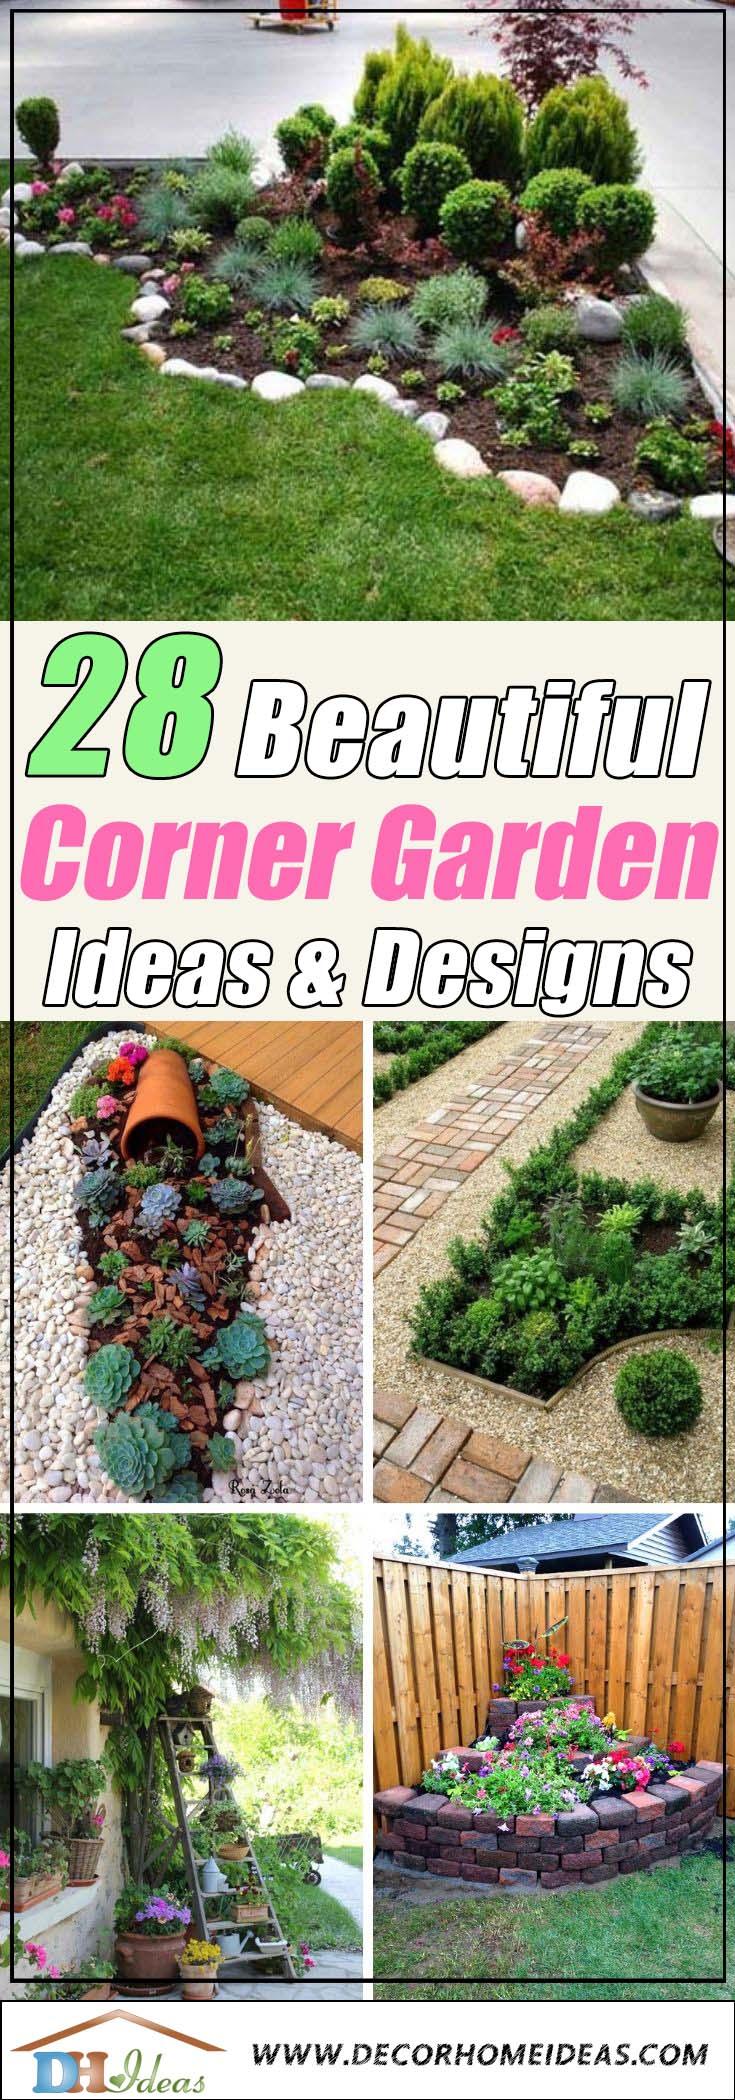 28 Beautiful Corner Garden Ideas and Designs in 2020 ...